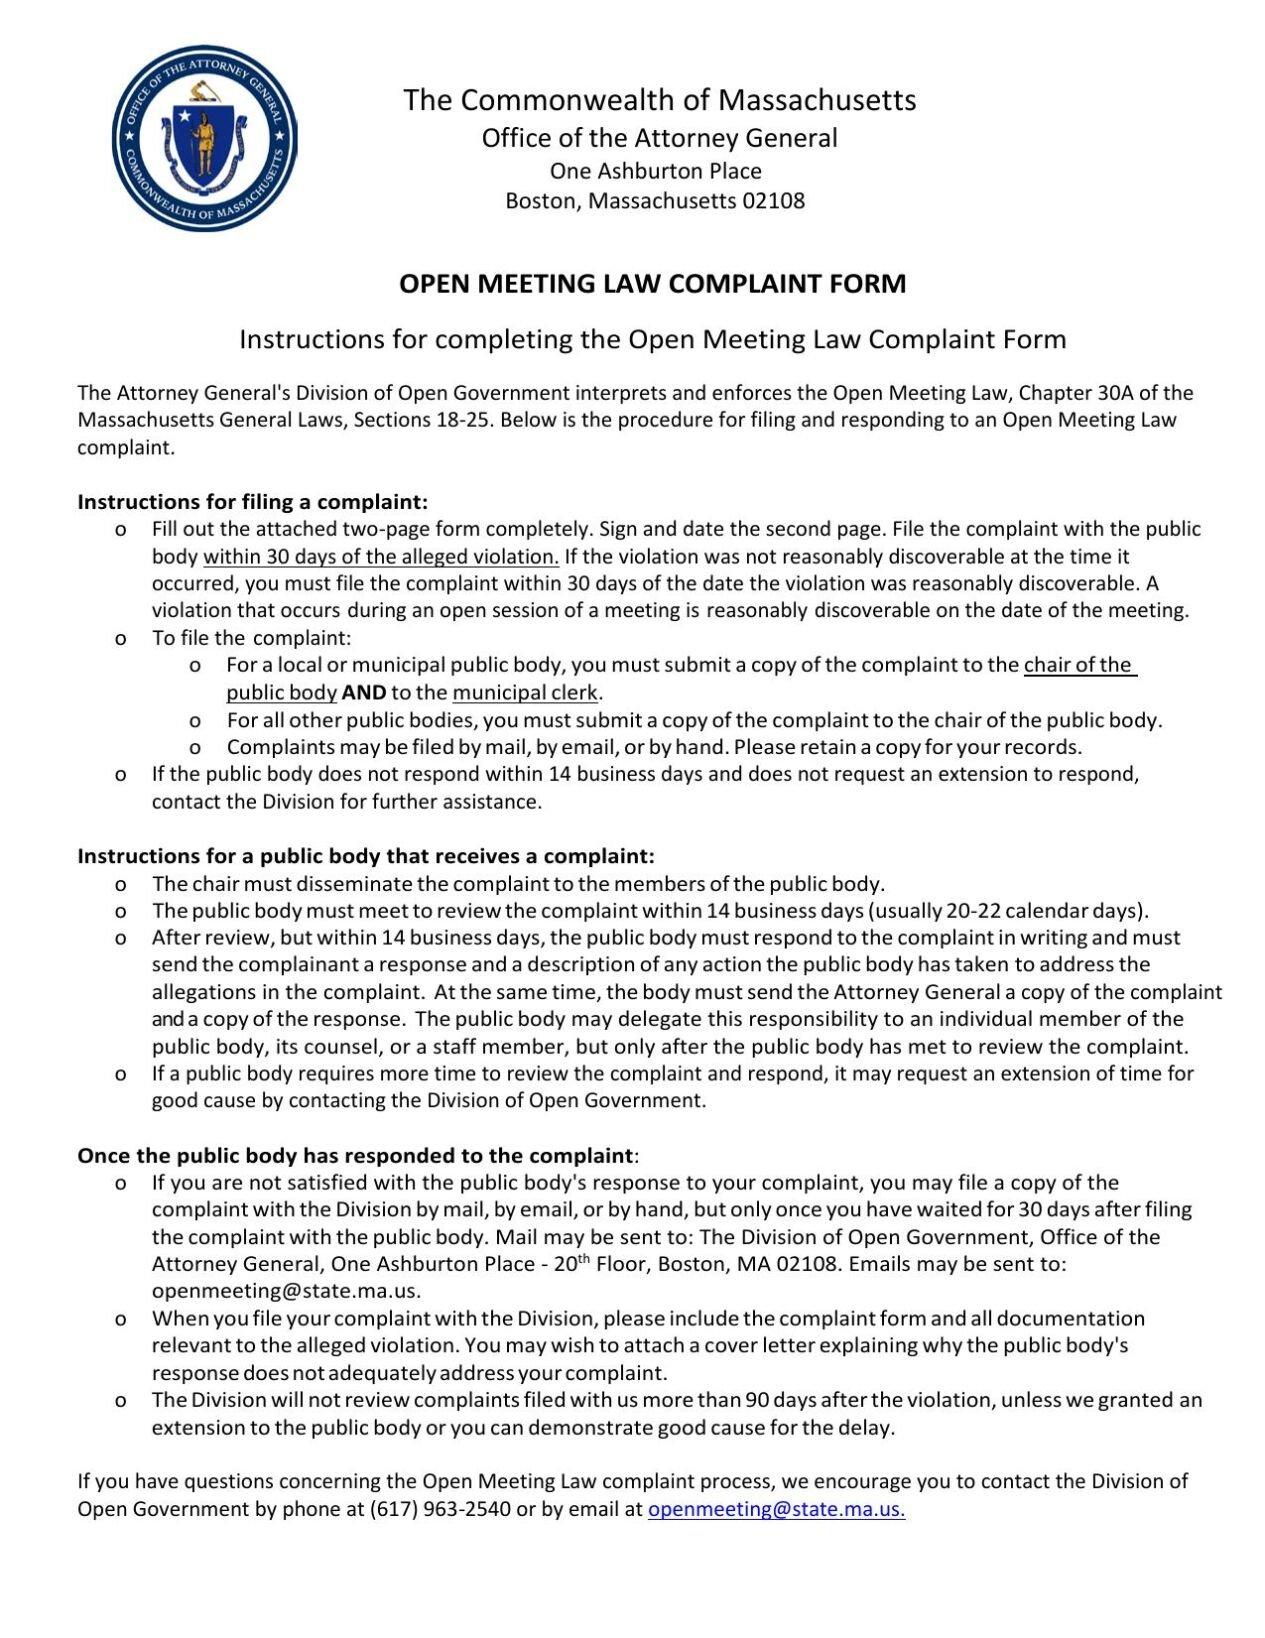 Attorney General's Office Open Meeting Law Complaint Form.pdf (201.34 KiB)